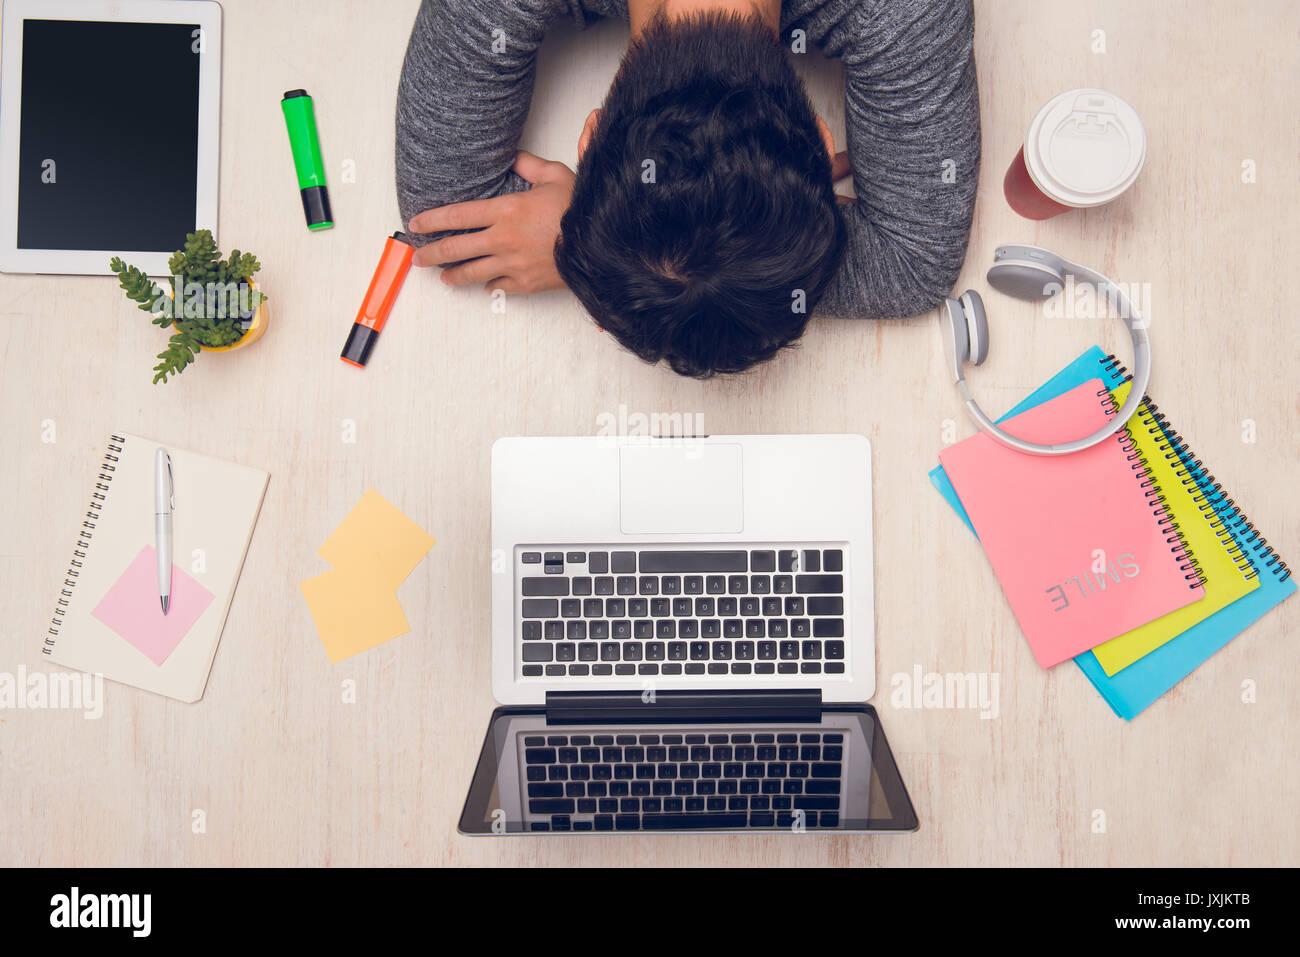 https://c8.alamy.com/comp/JXJKTB/student-guy-sleeping-on-desk-with-books-around-top-view-JXJKTB.jpg